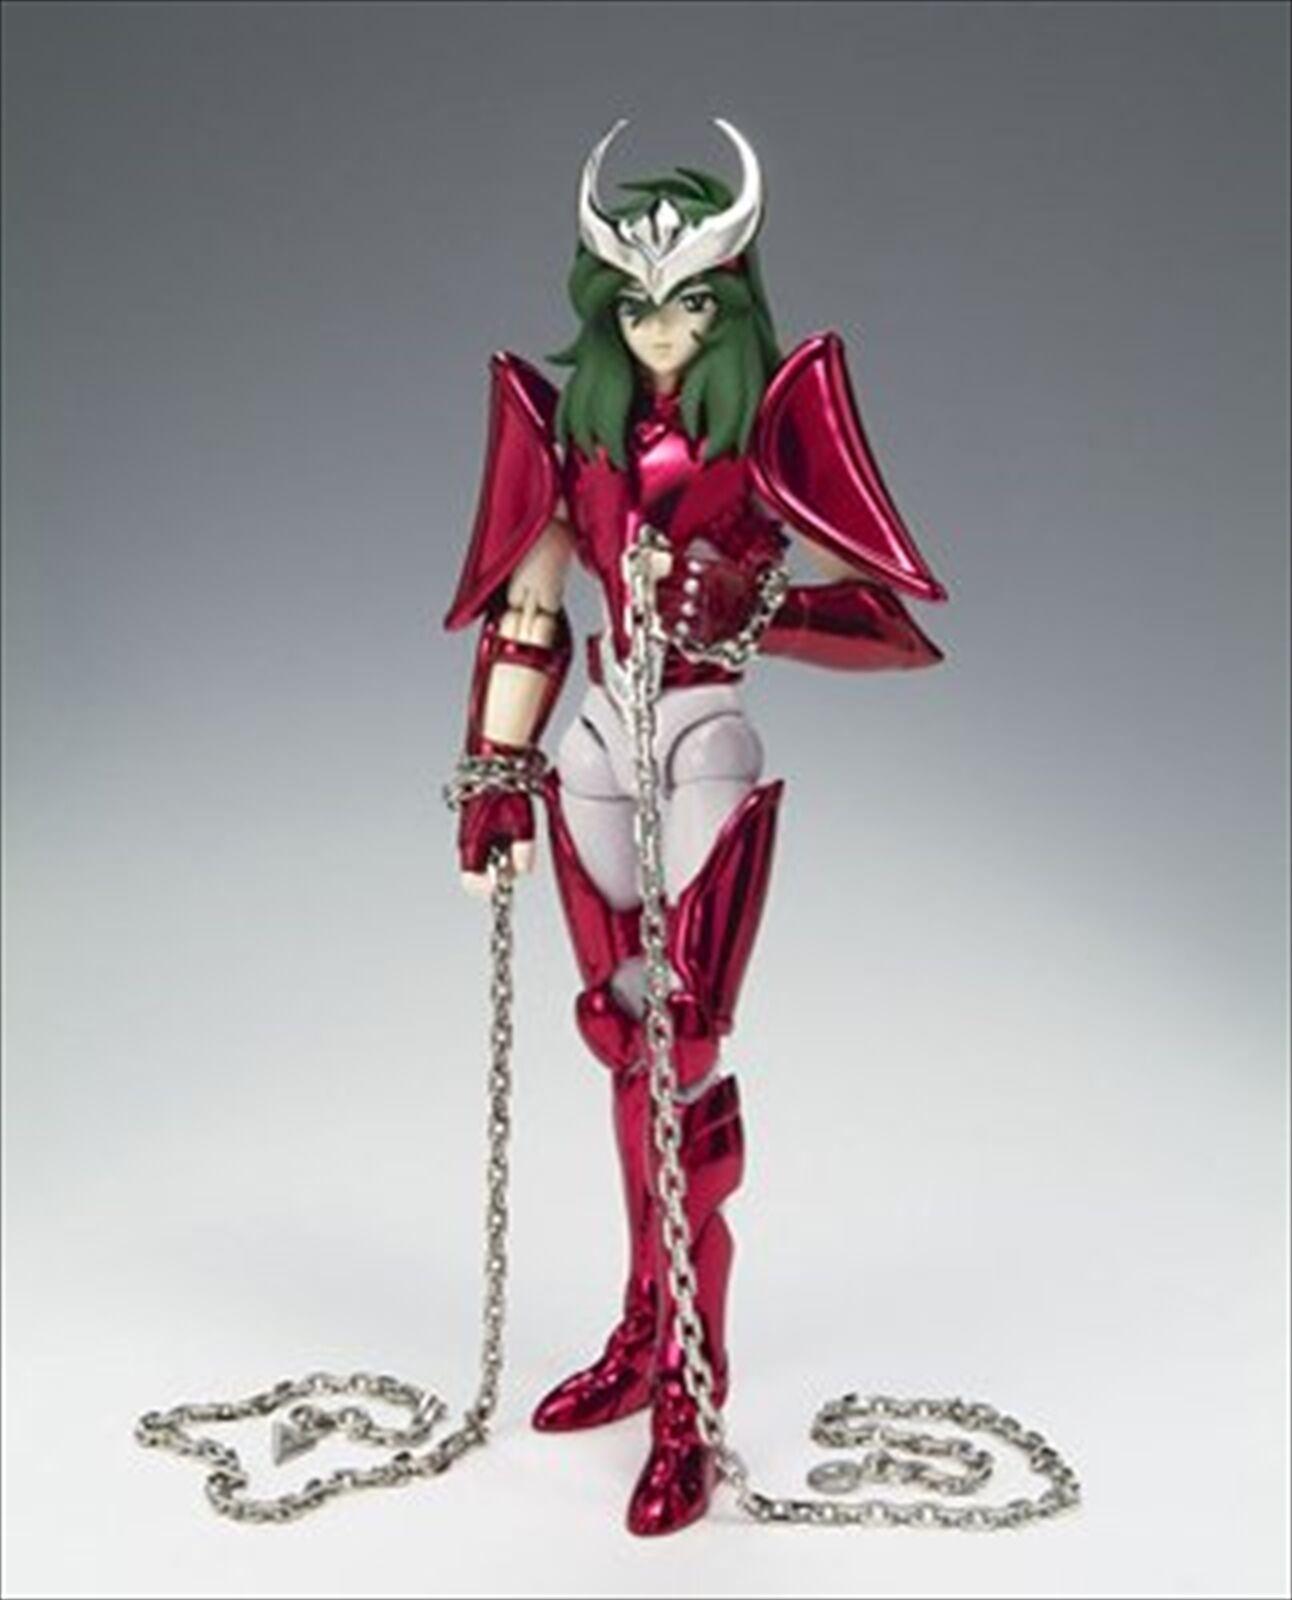 Bandai Saint Seiya Cloth Myth Andromeda Shun Power of Gold Action Figure